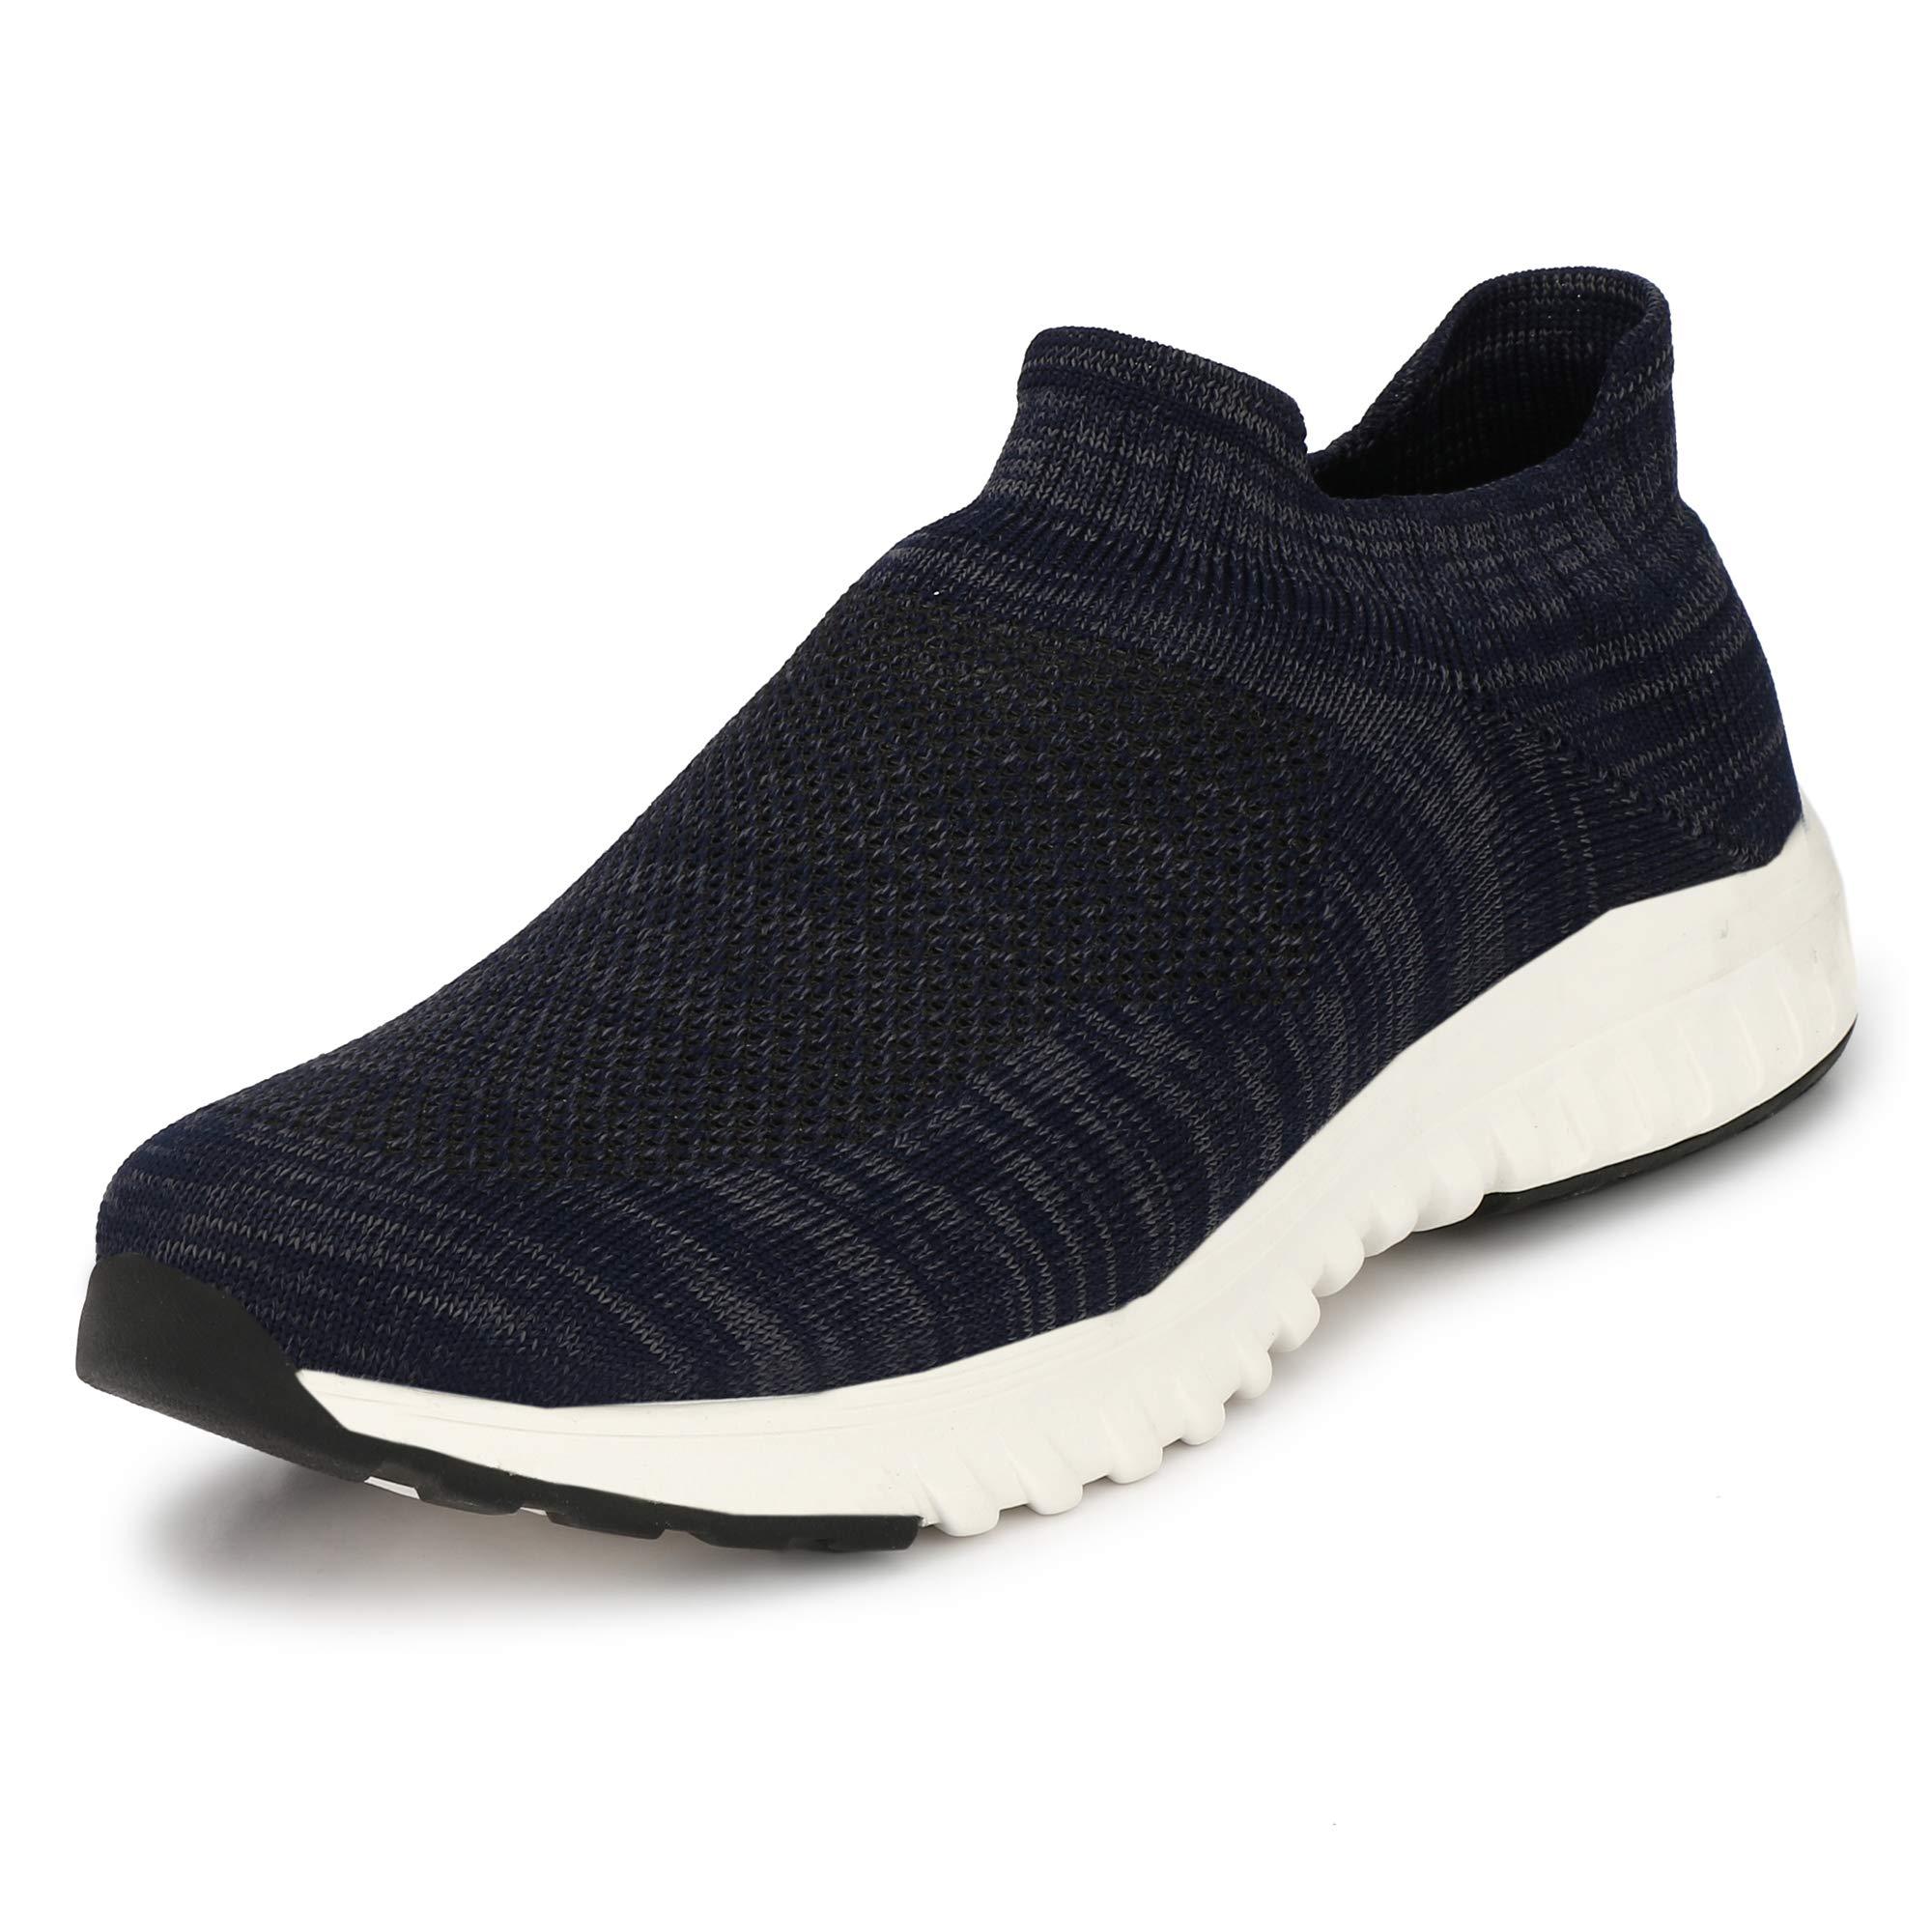 WOODBAY Mens Grey Running Shoes (10, Navy Blue) (B07VRB5L2L) Amazon Price History, Amazon Price Tracker